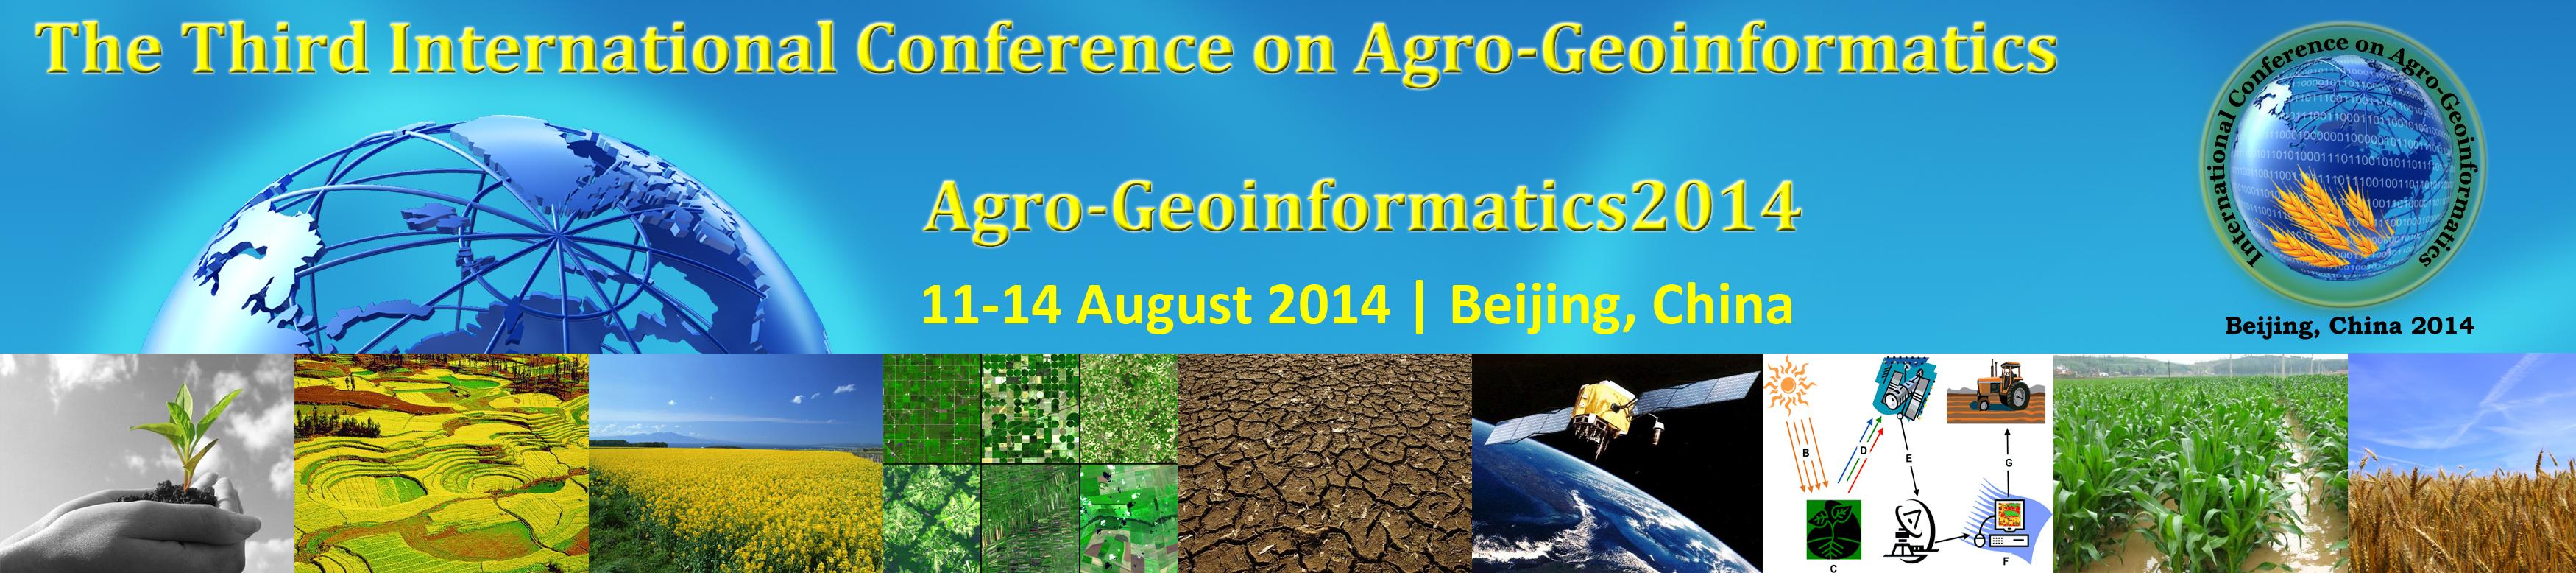 Agro-Geoinformatics 2014